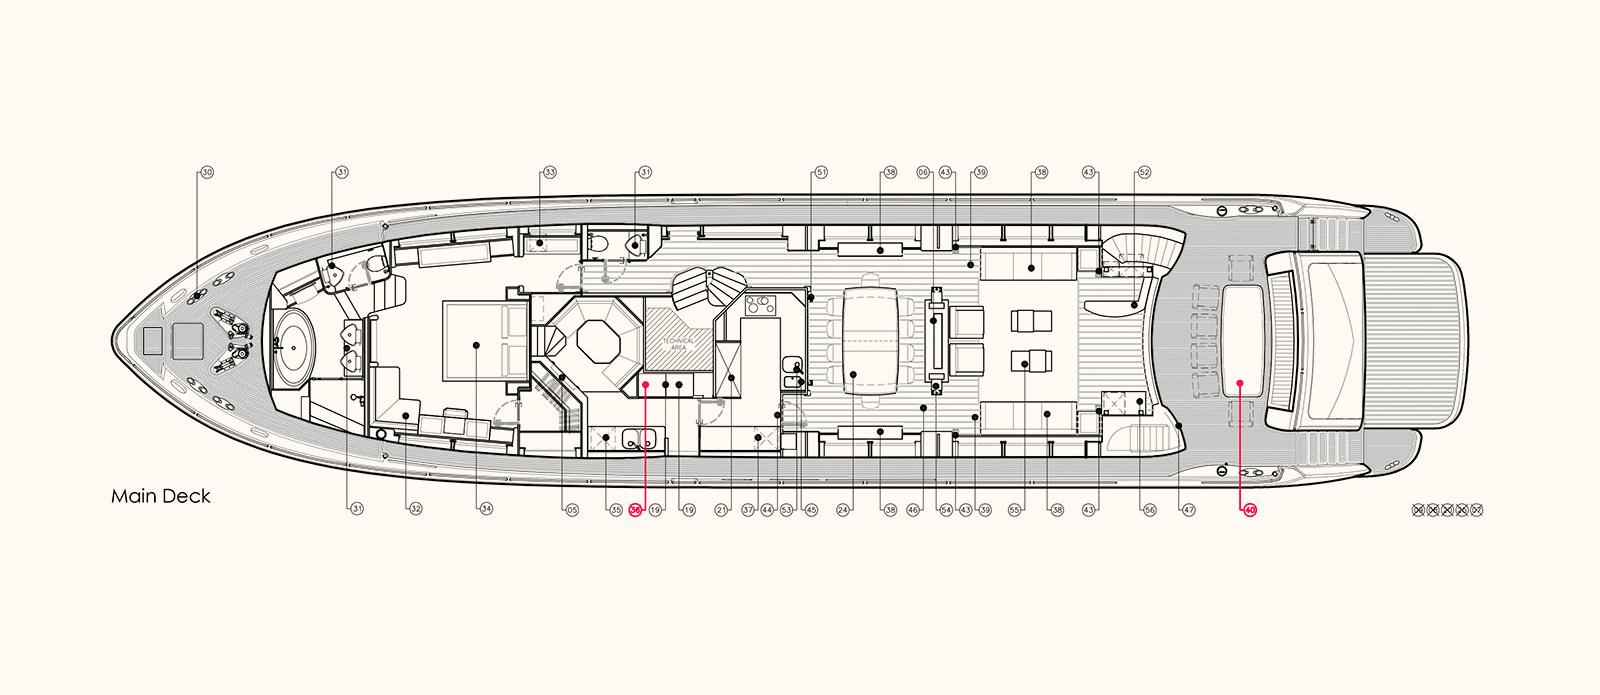 Emoji - Main Deck Floor Plan